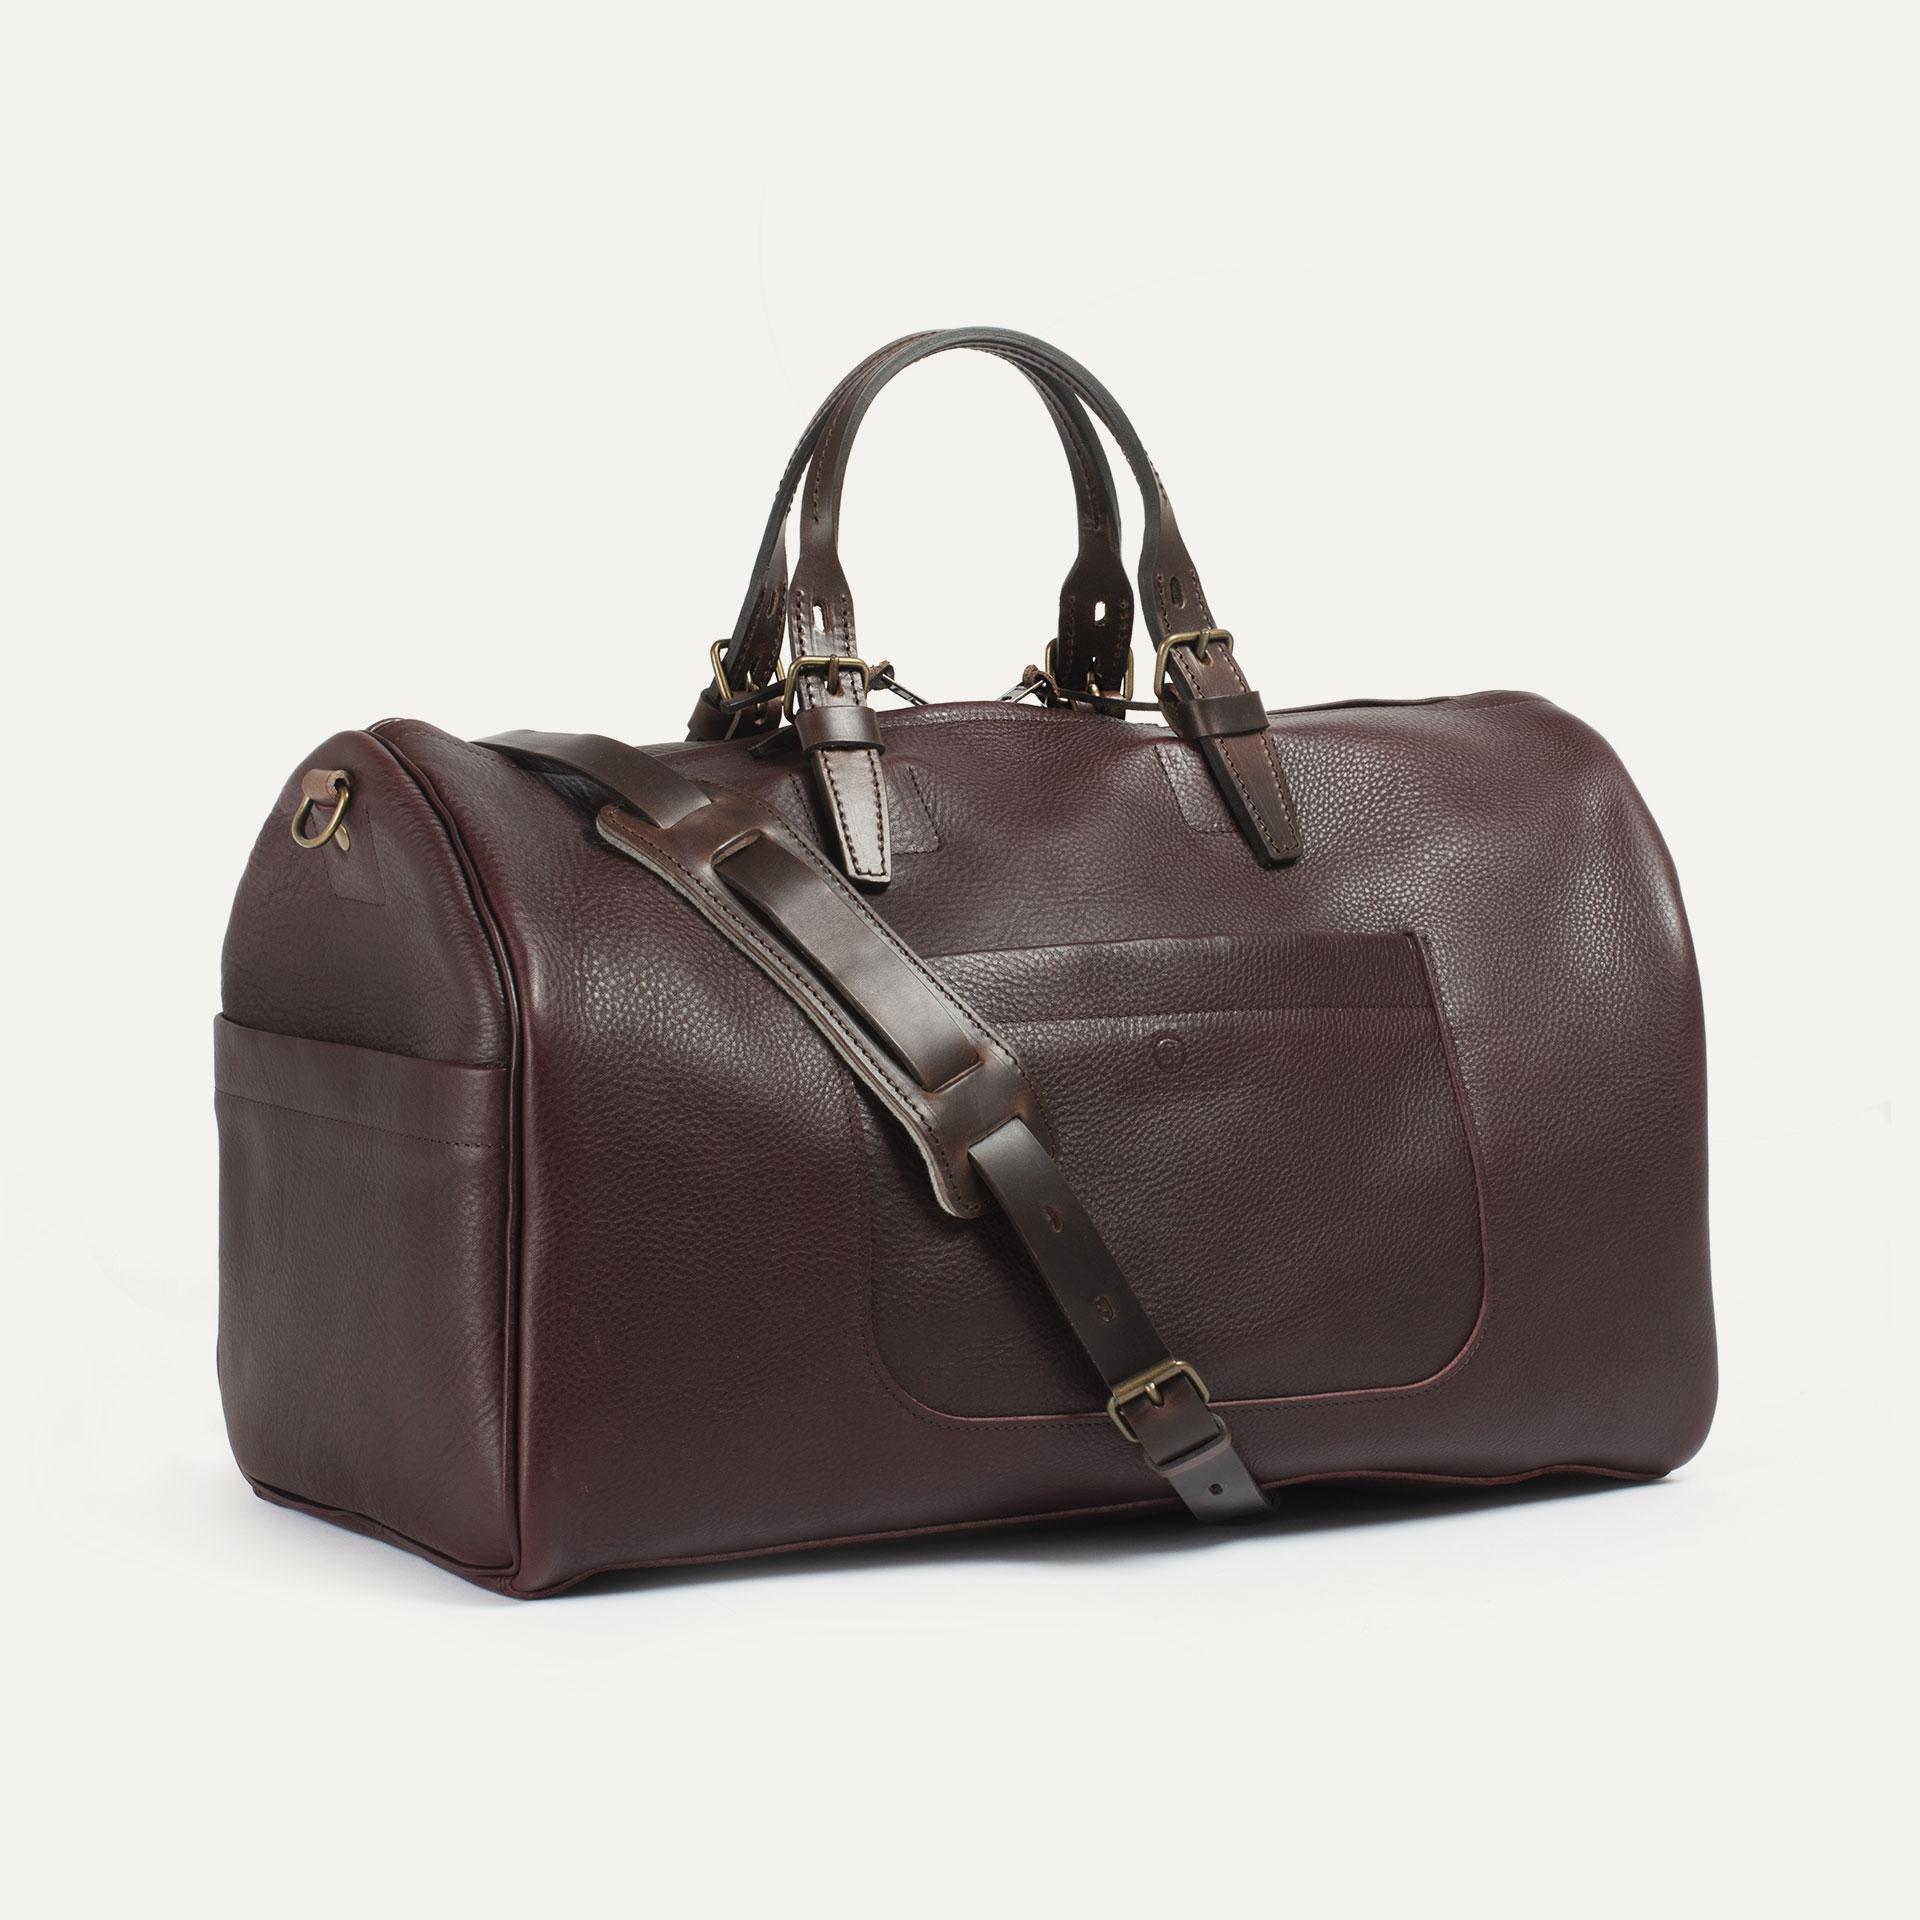 Hobo Travel bag - Peat (image n°2)